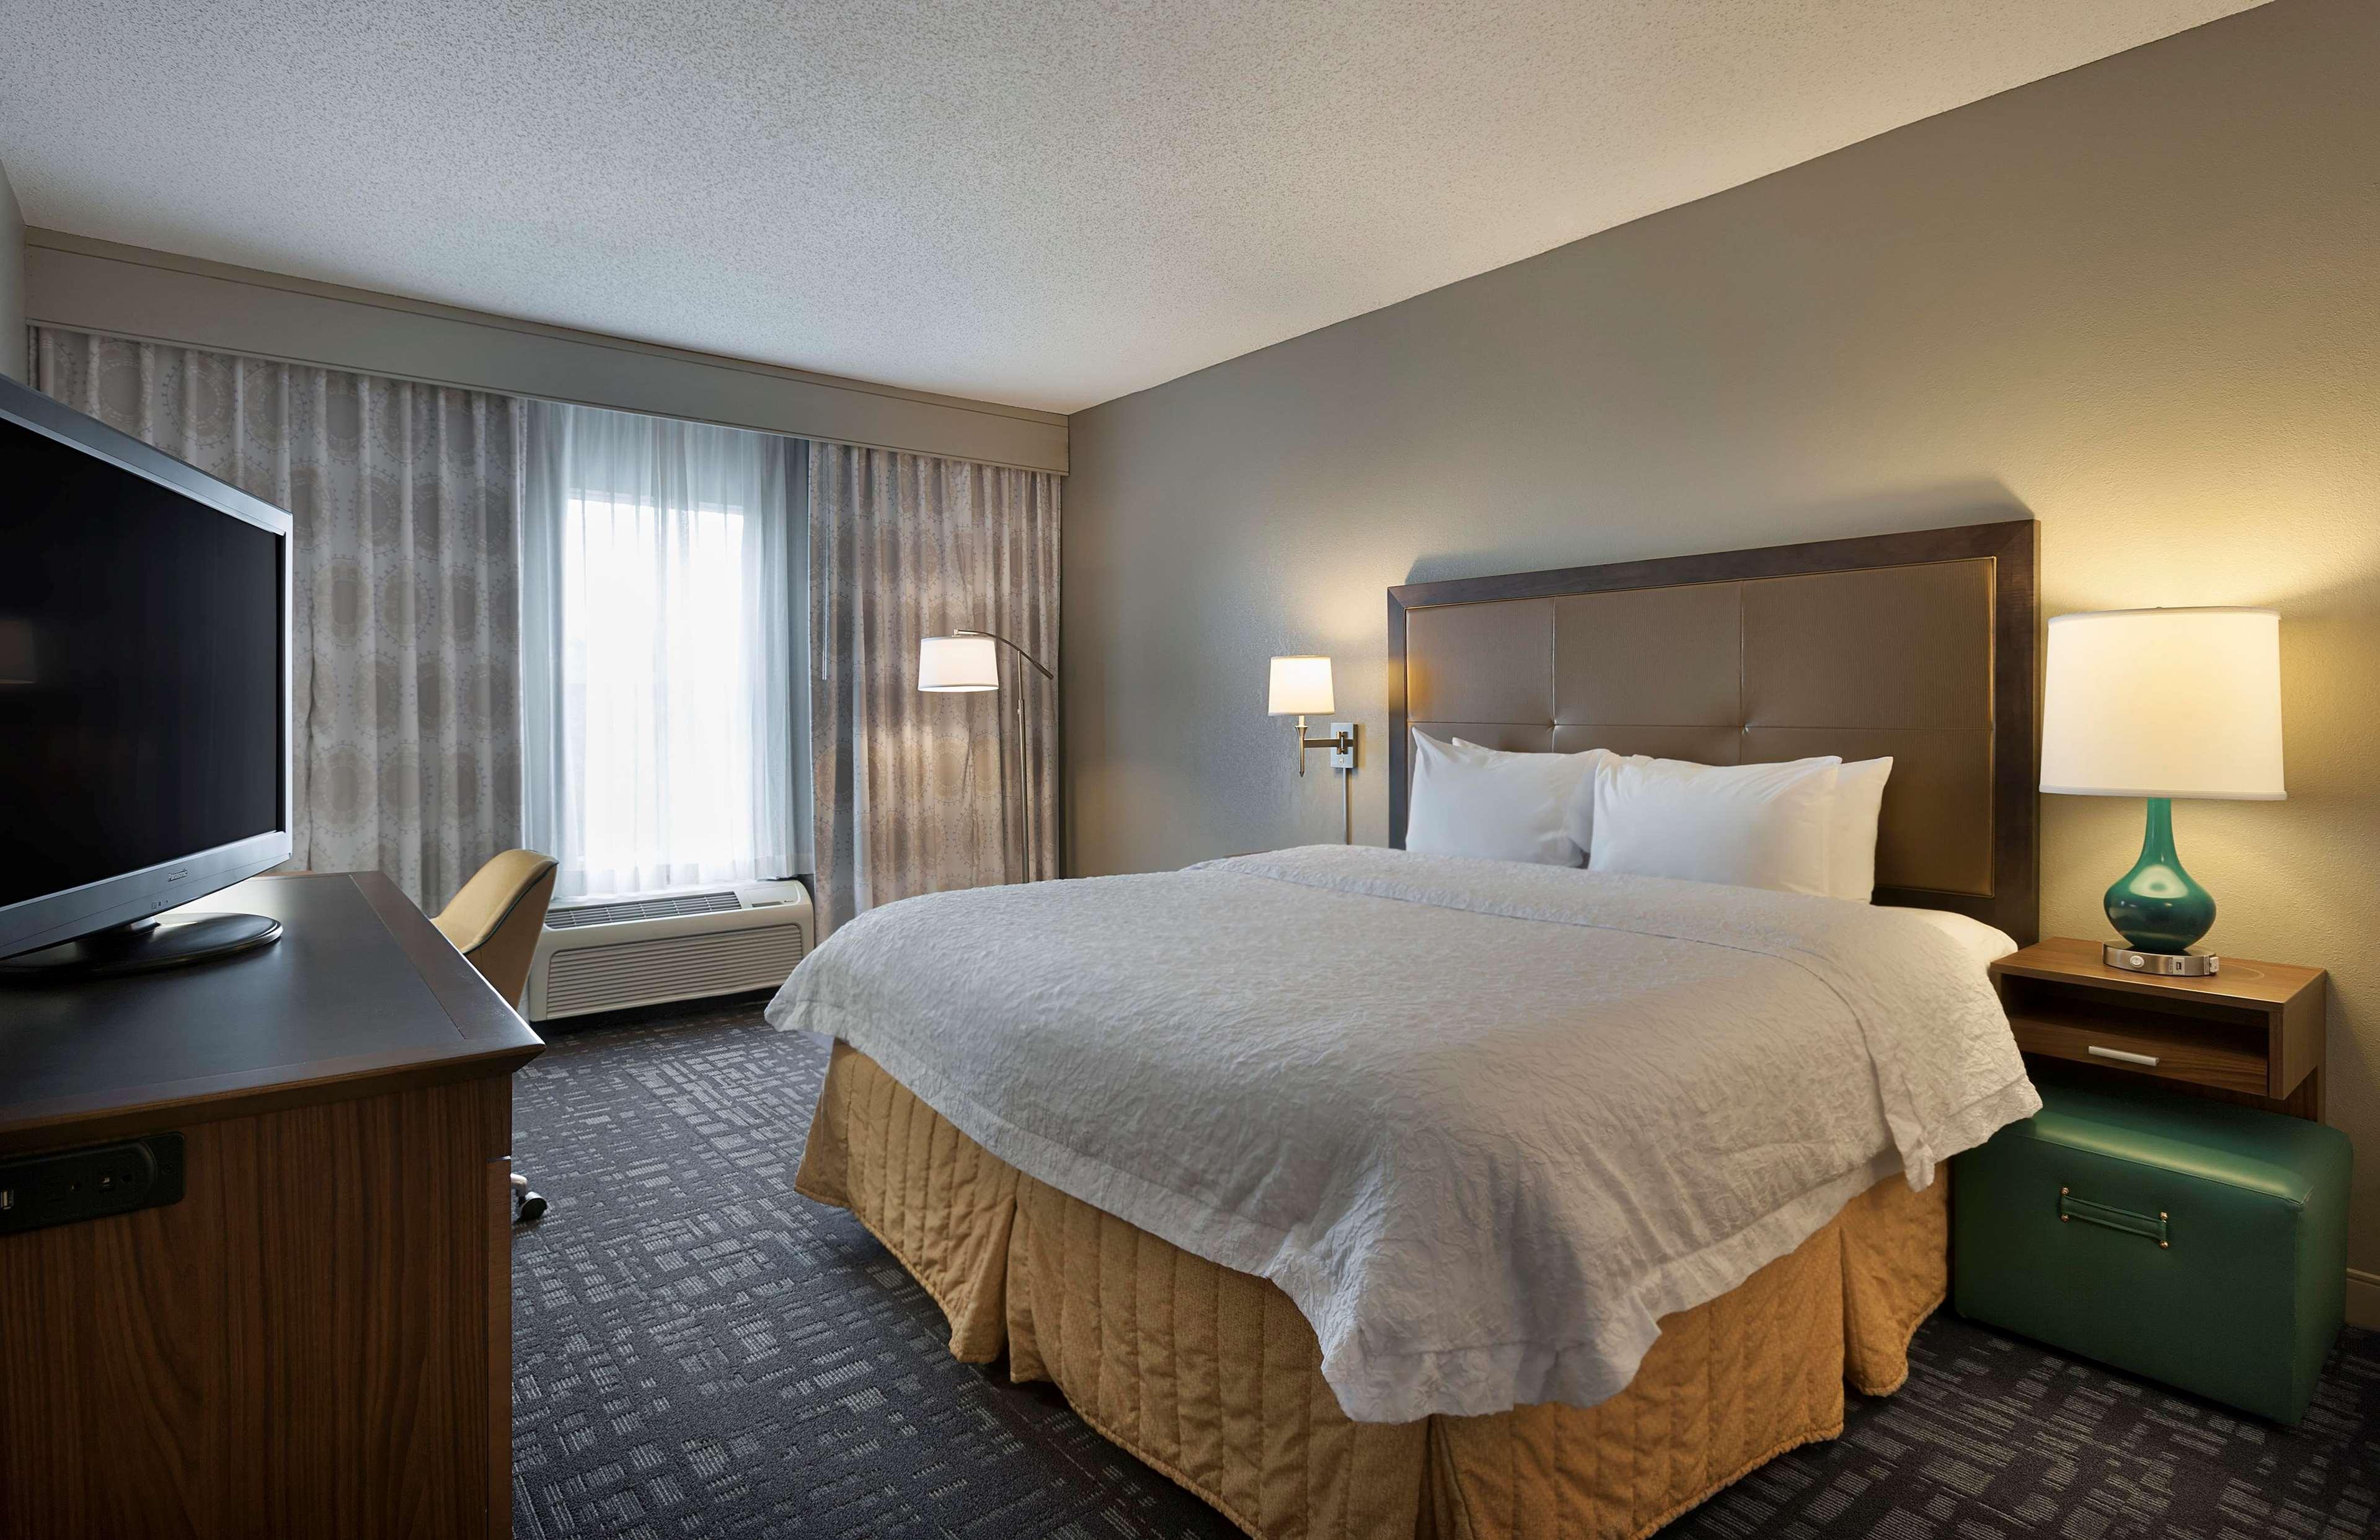 Hampton Inn & Suites Charlotte/Pineville image 23